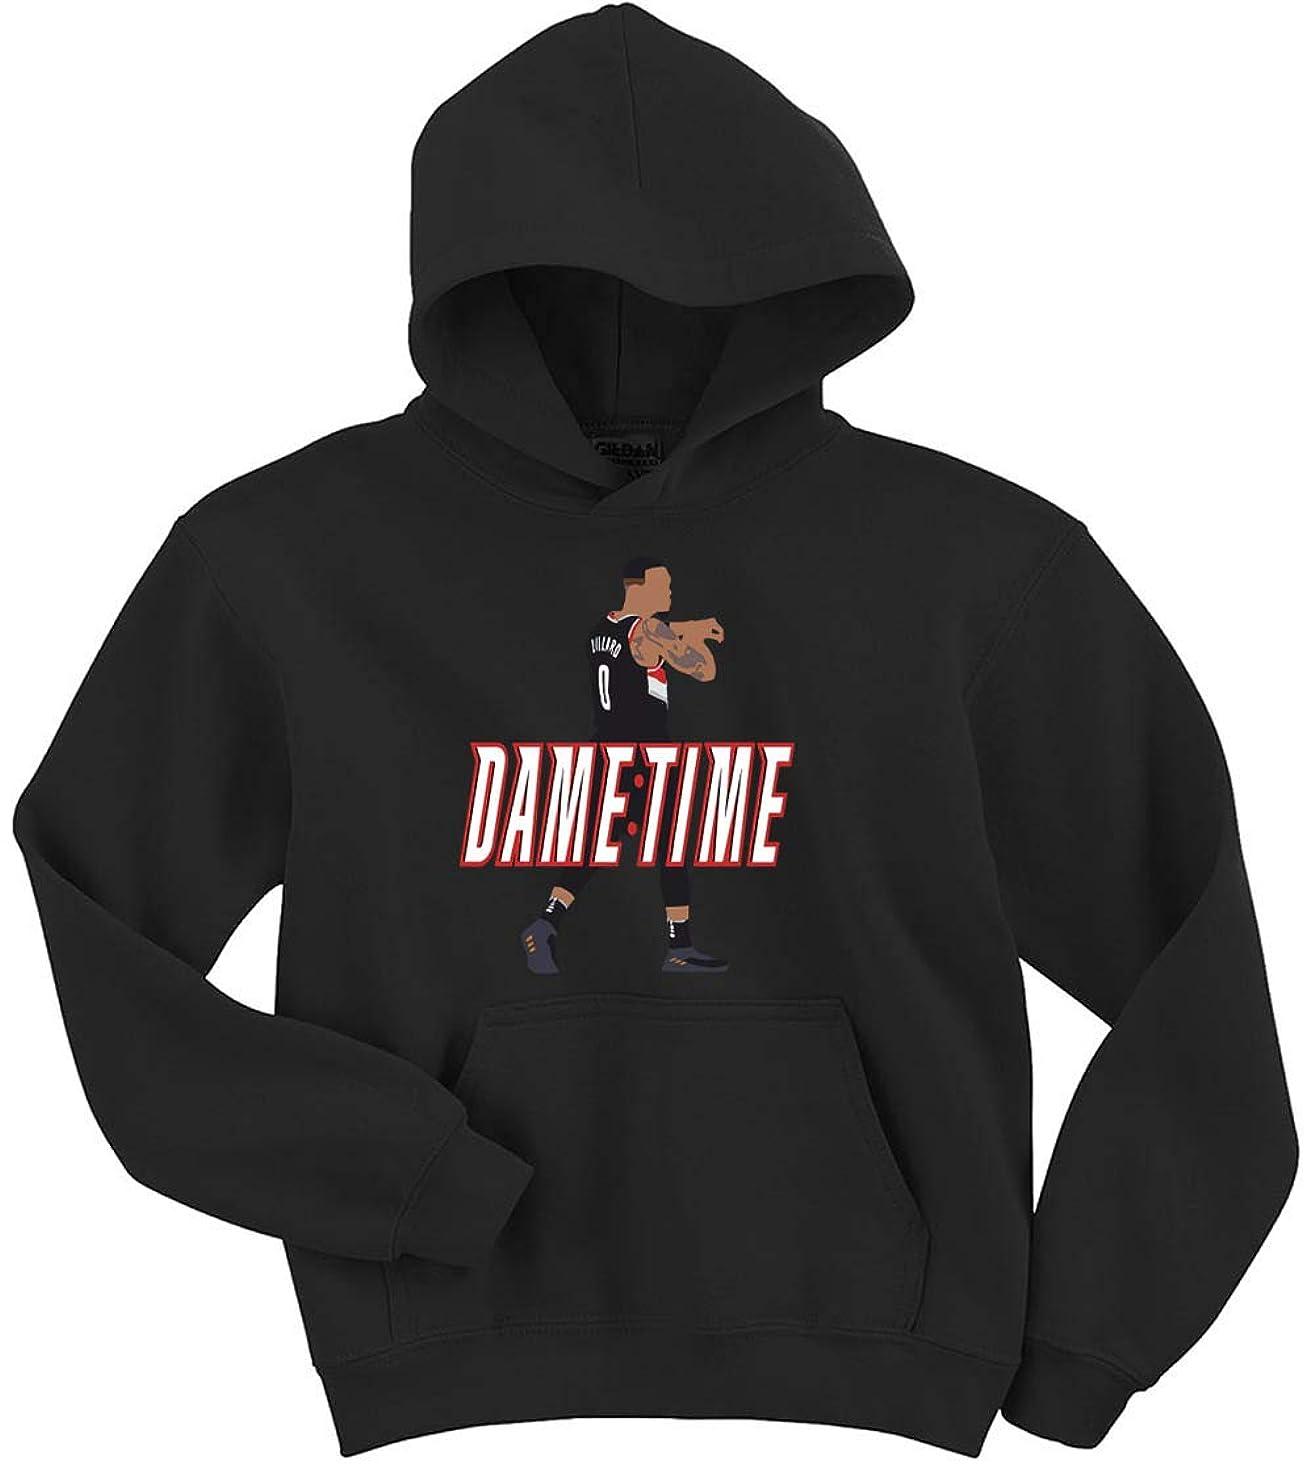 Black Portland Lillard It's Dame Time Hooded Sweatshirt